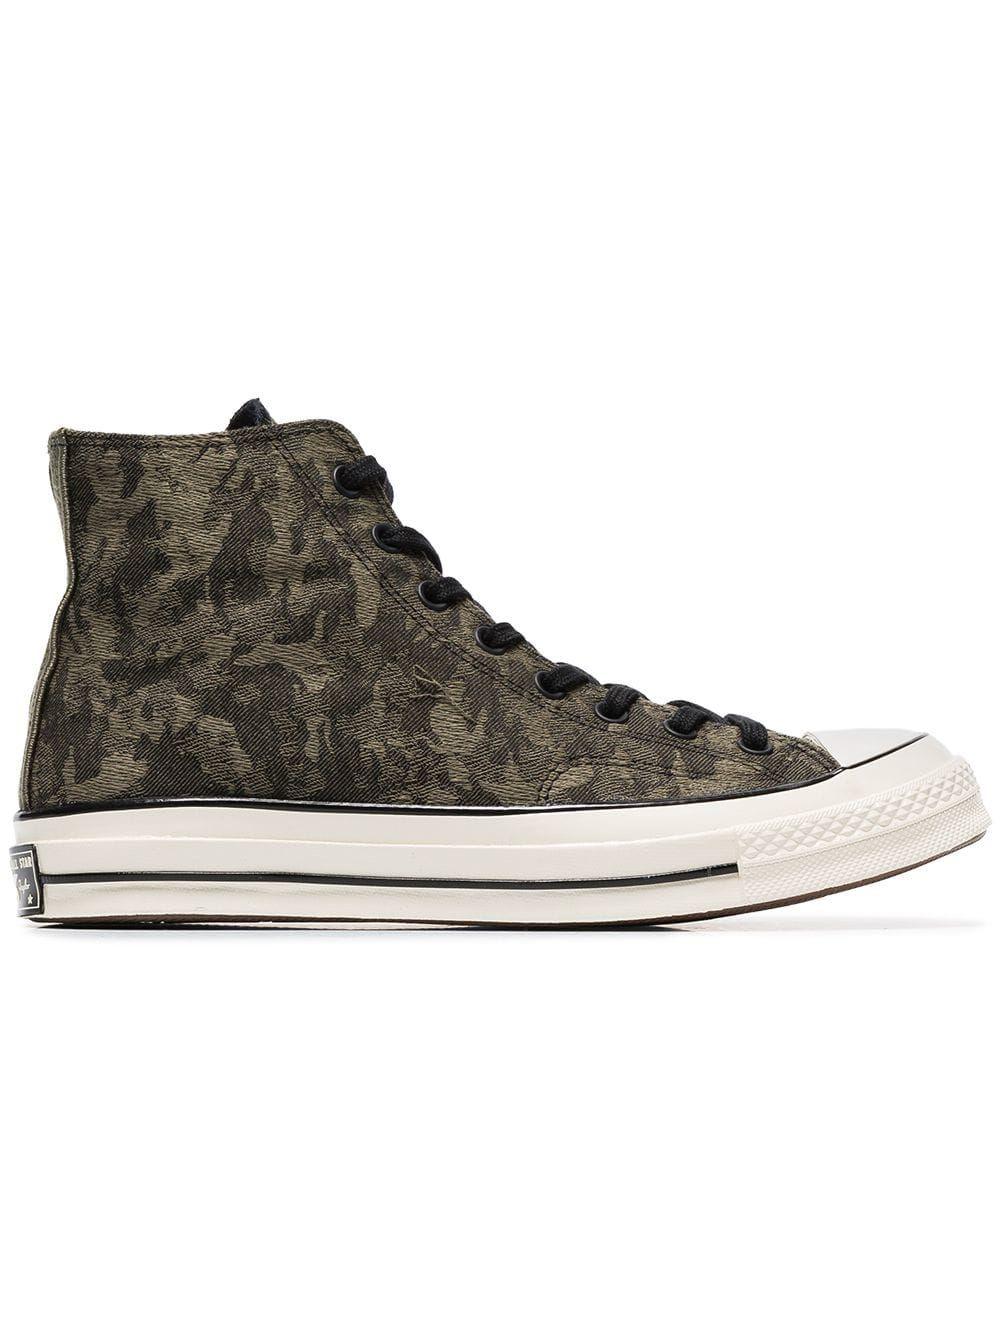 Converse Green Chuck 70 Camouflage